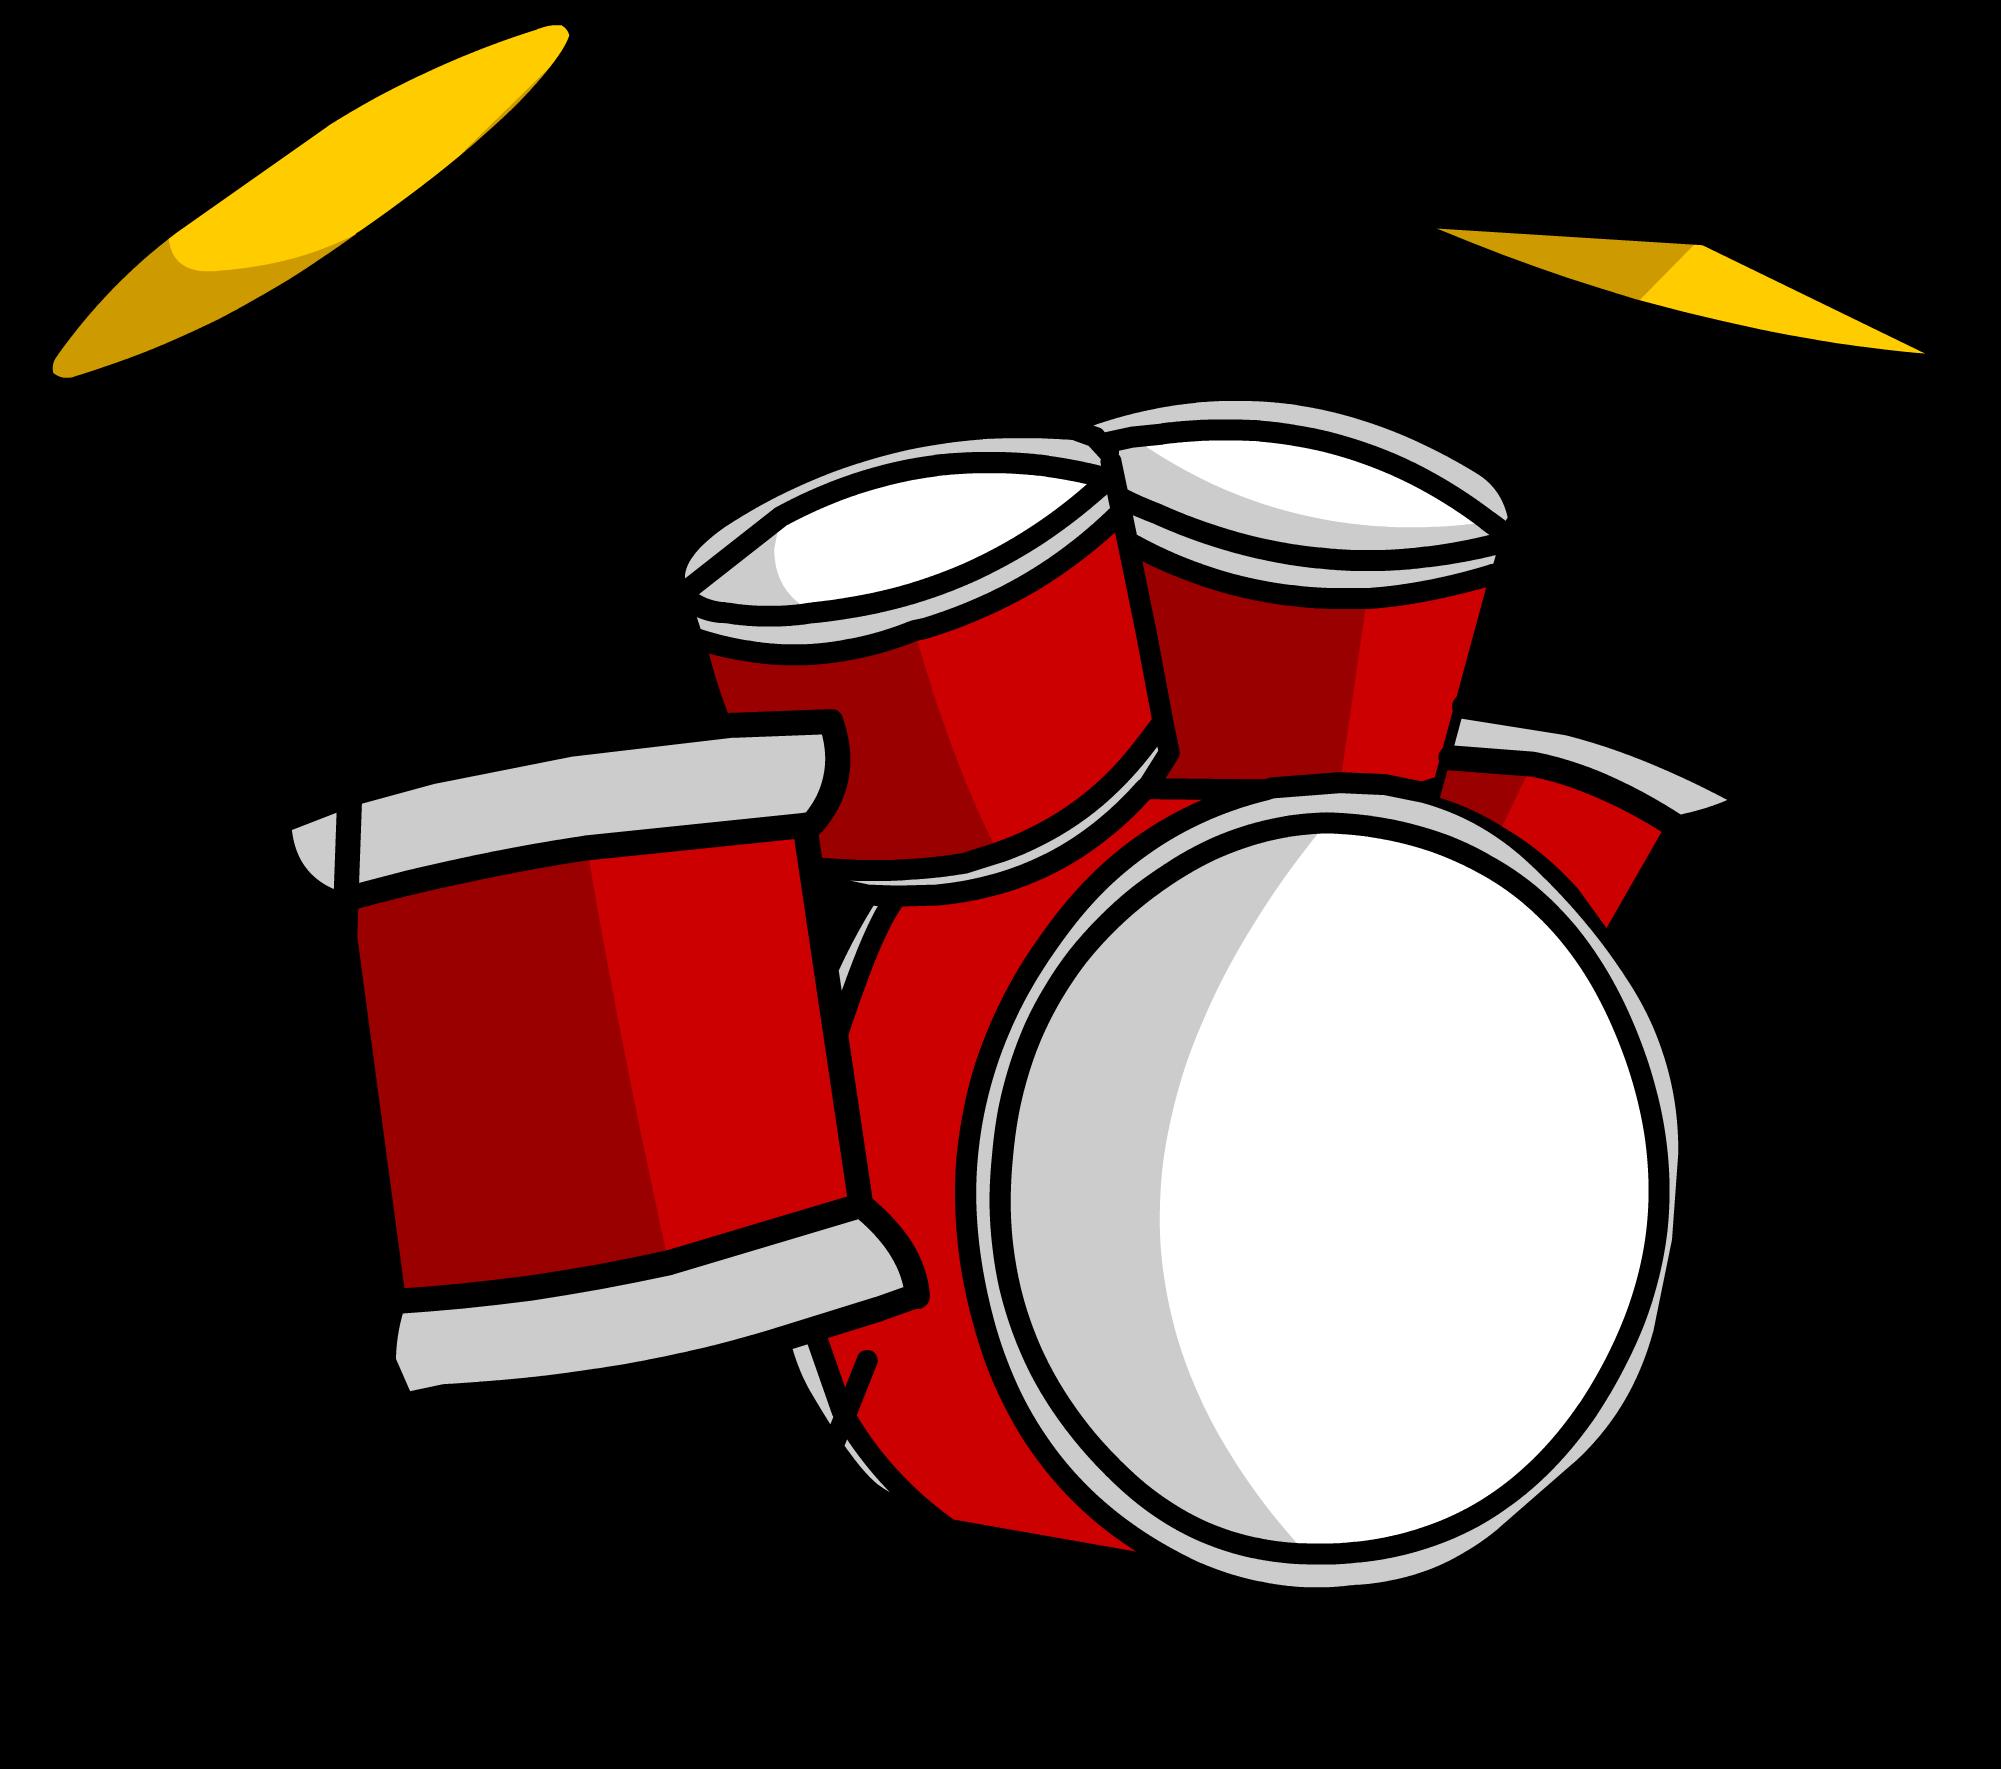 Drum Set Png.